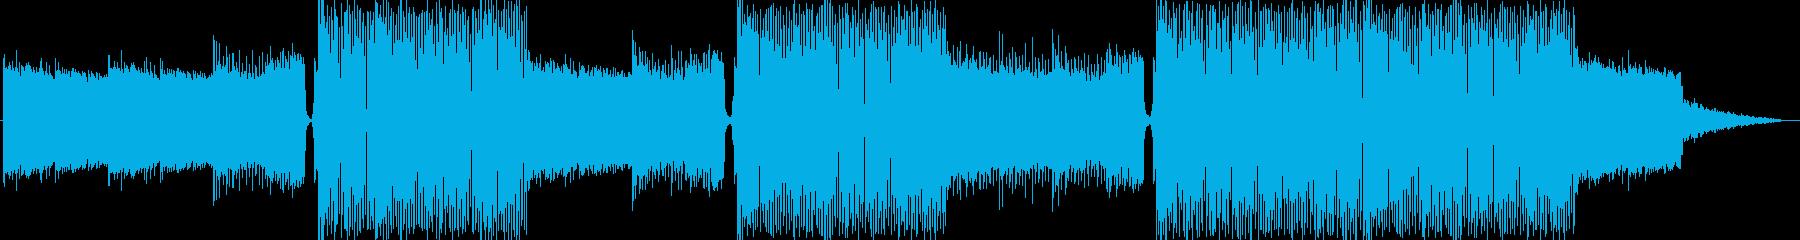 EDMクラブ系ダンスミュージック-06の再生済みの波形